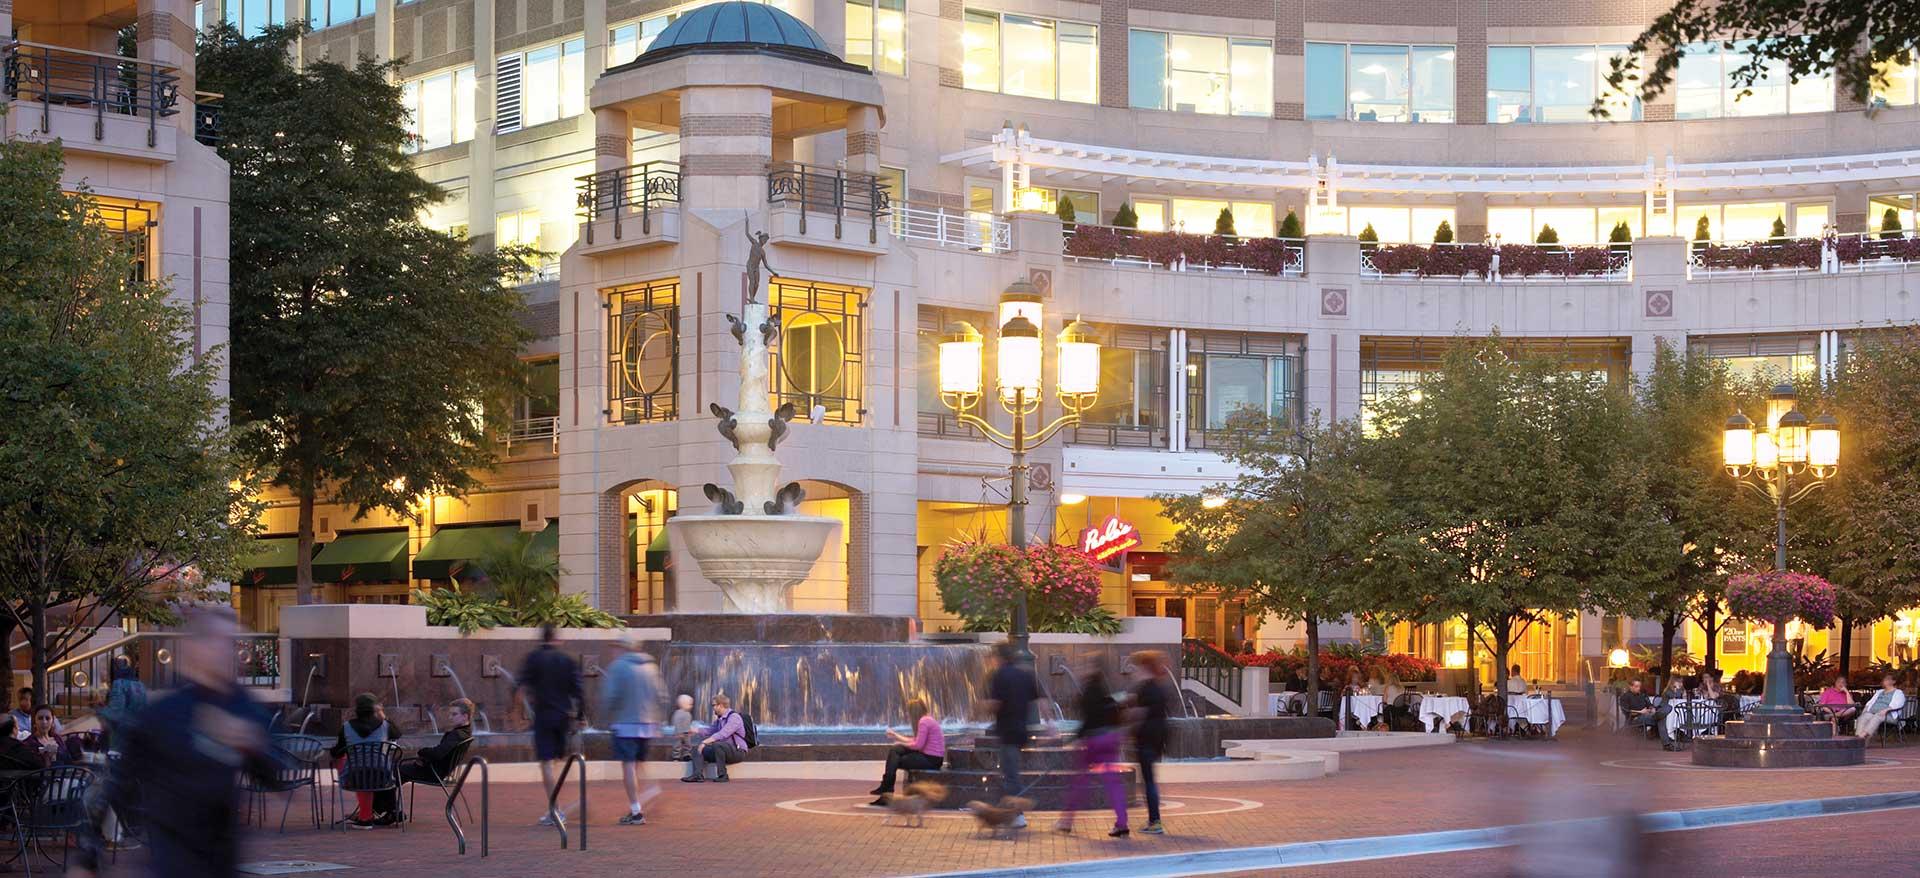 Reston Town Center street scene with fountain